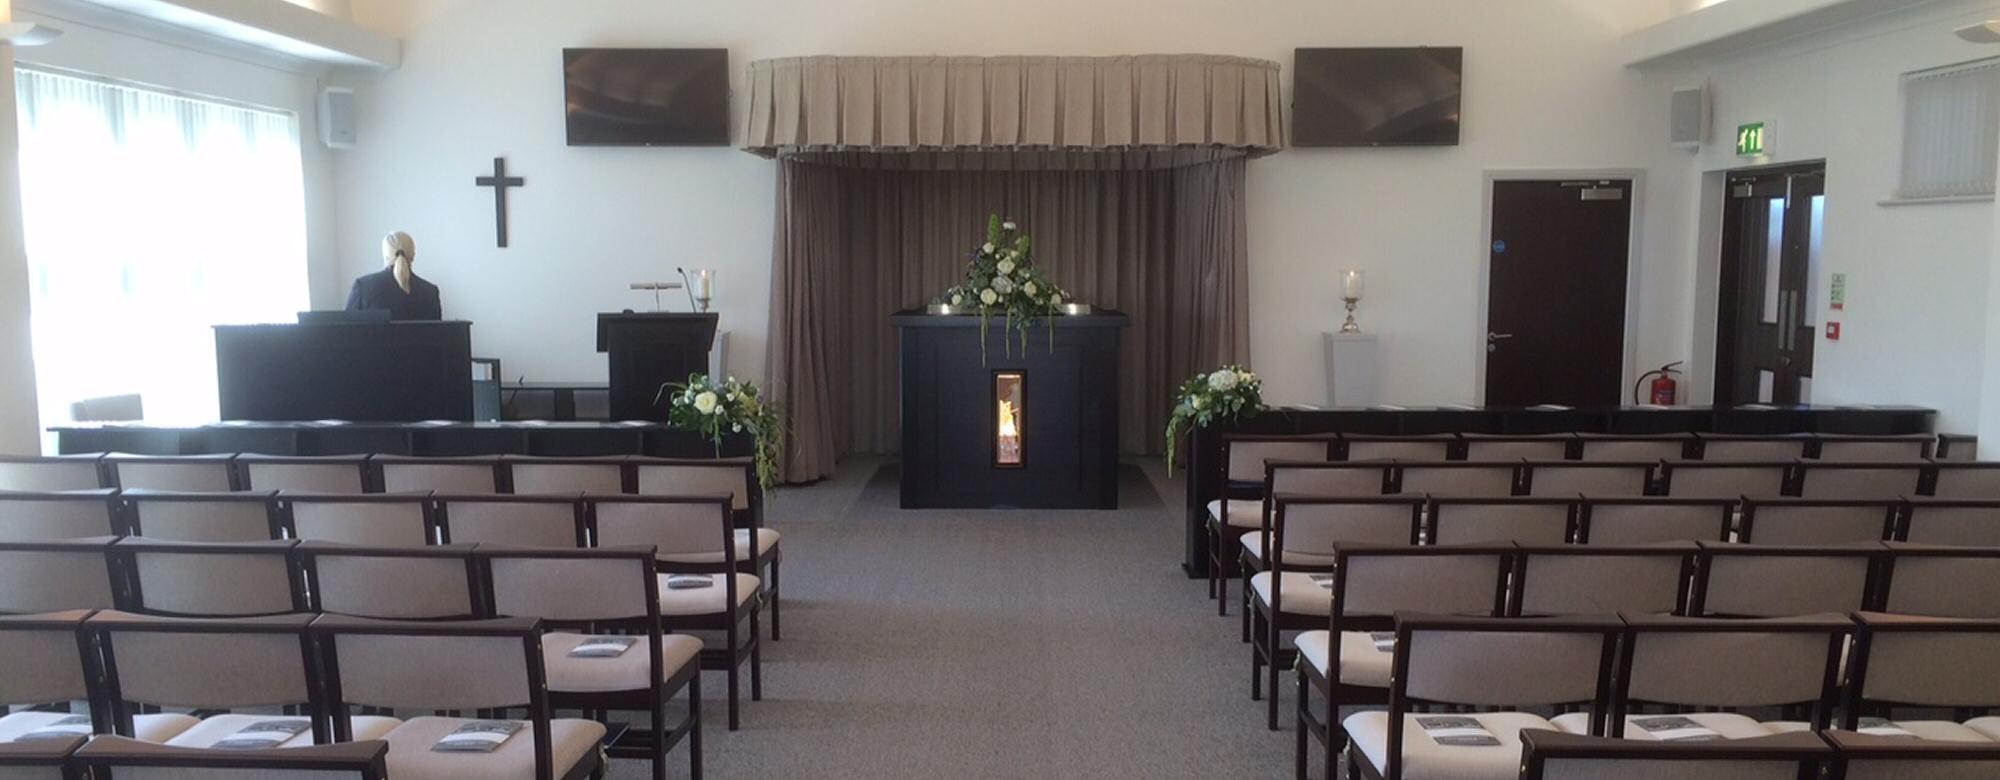 South Leicestershire Crematorium - Chapel